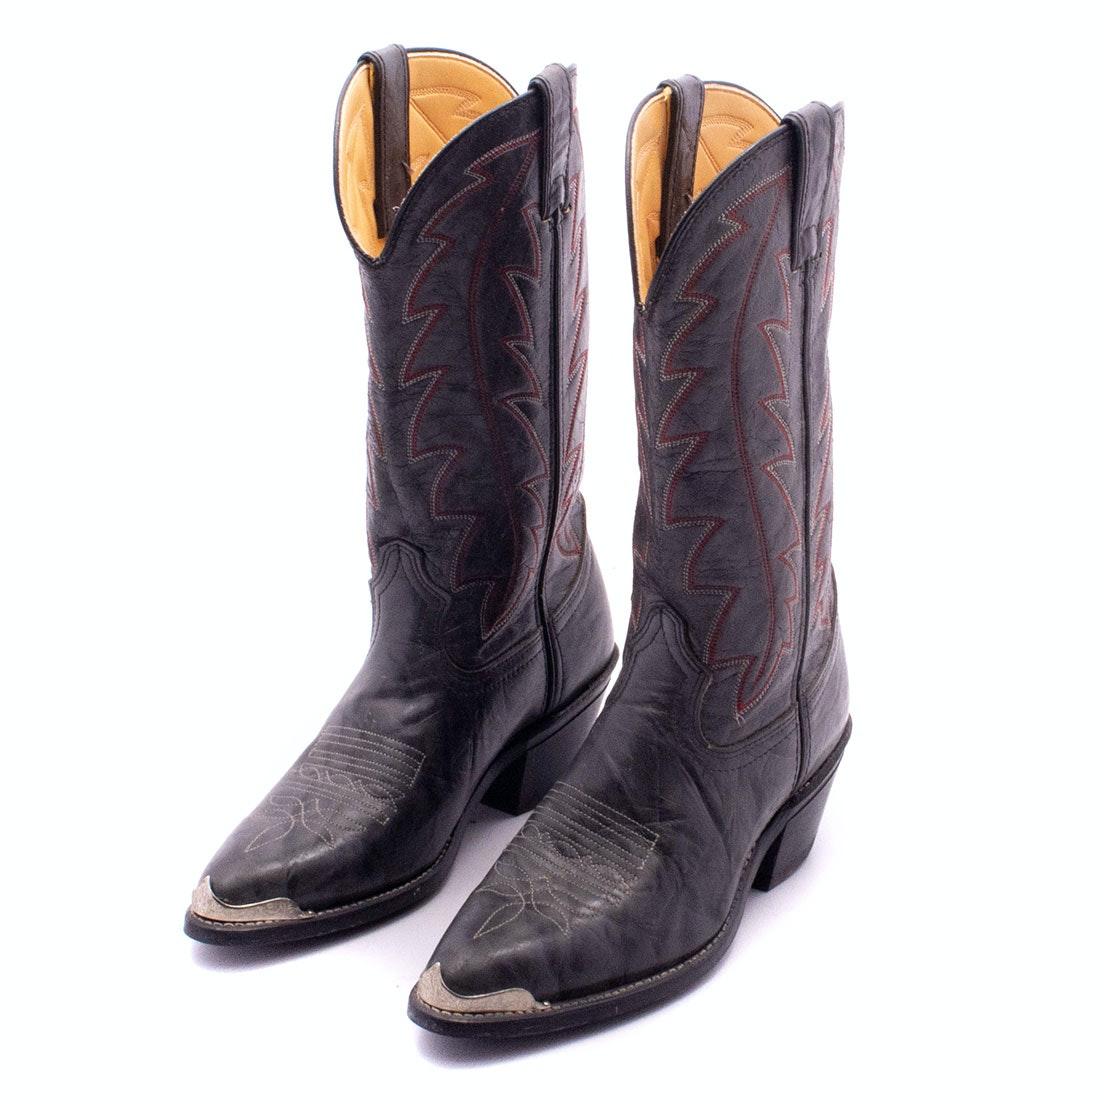 Women's Durango Western Boots in Dark Grey Leather